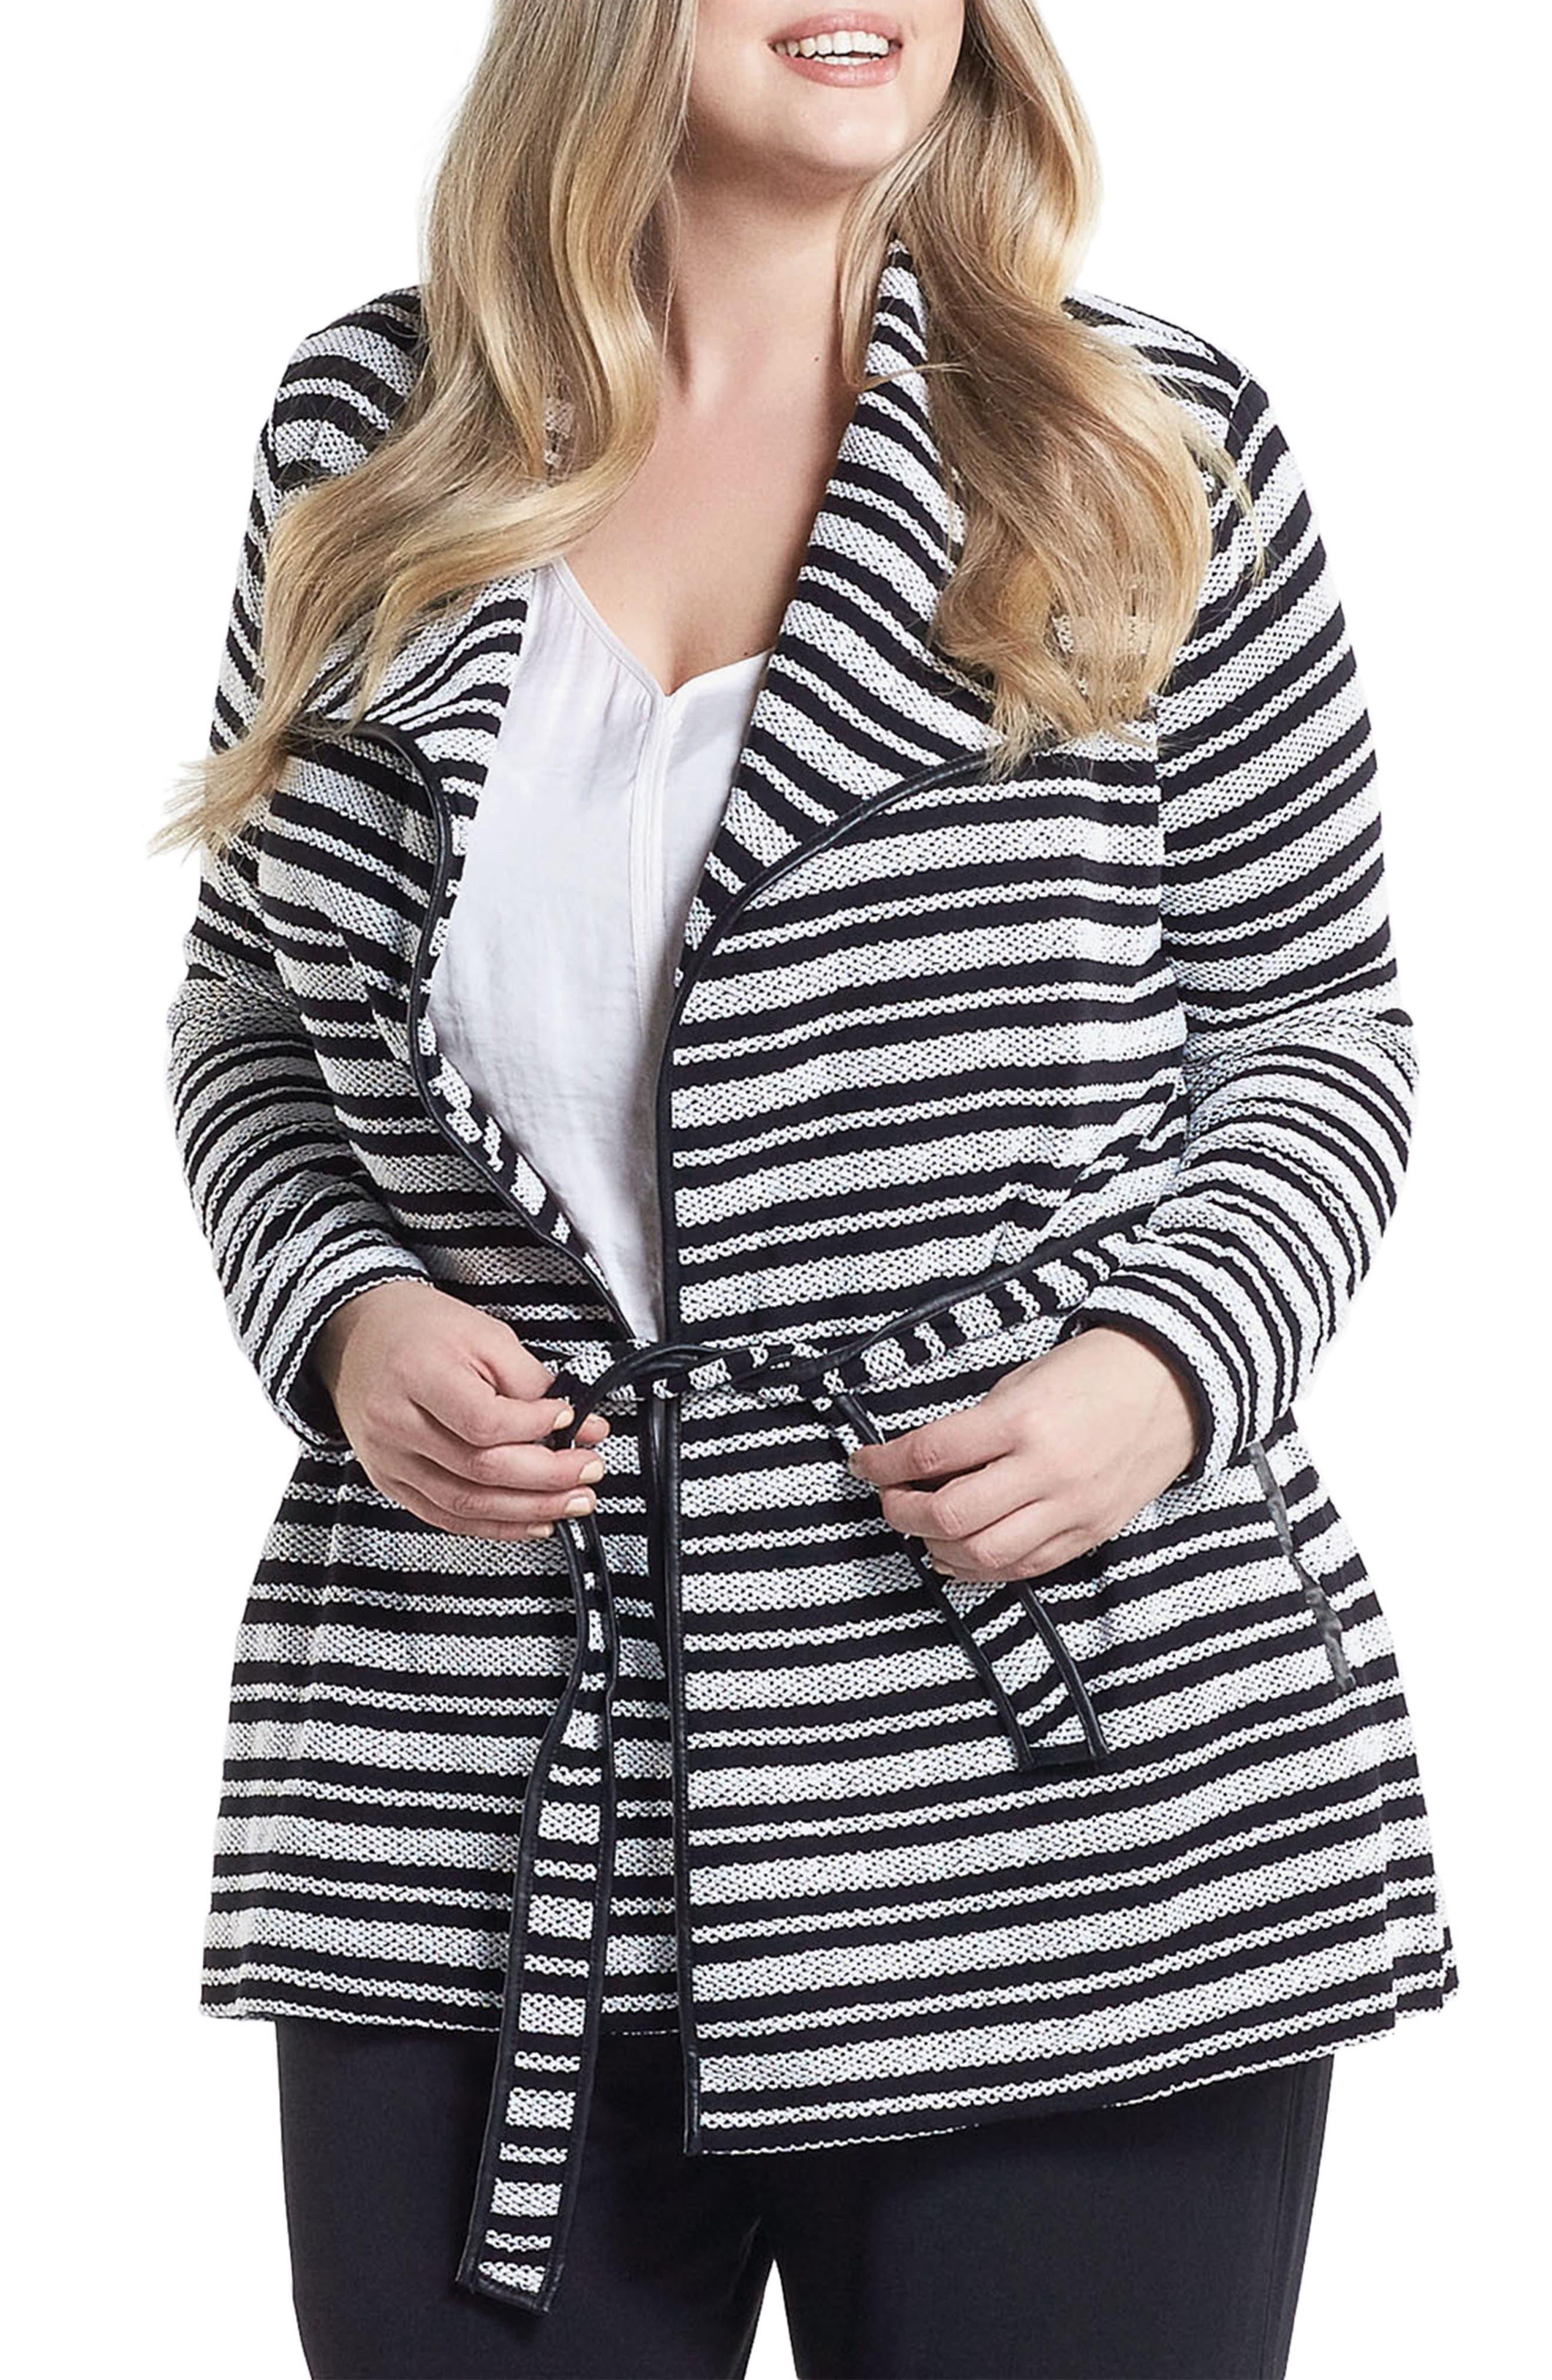 Xena Belted Stripe Knit Jacket,                             Main thumbnail 1, color,                             Black/ White Stripe